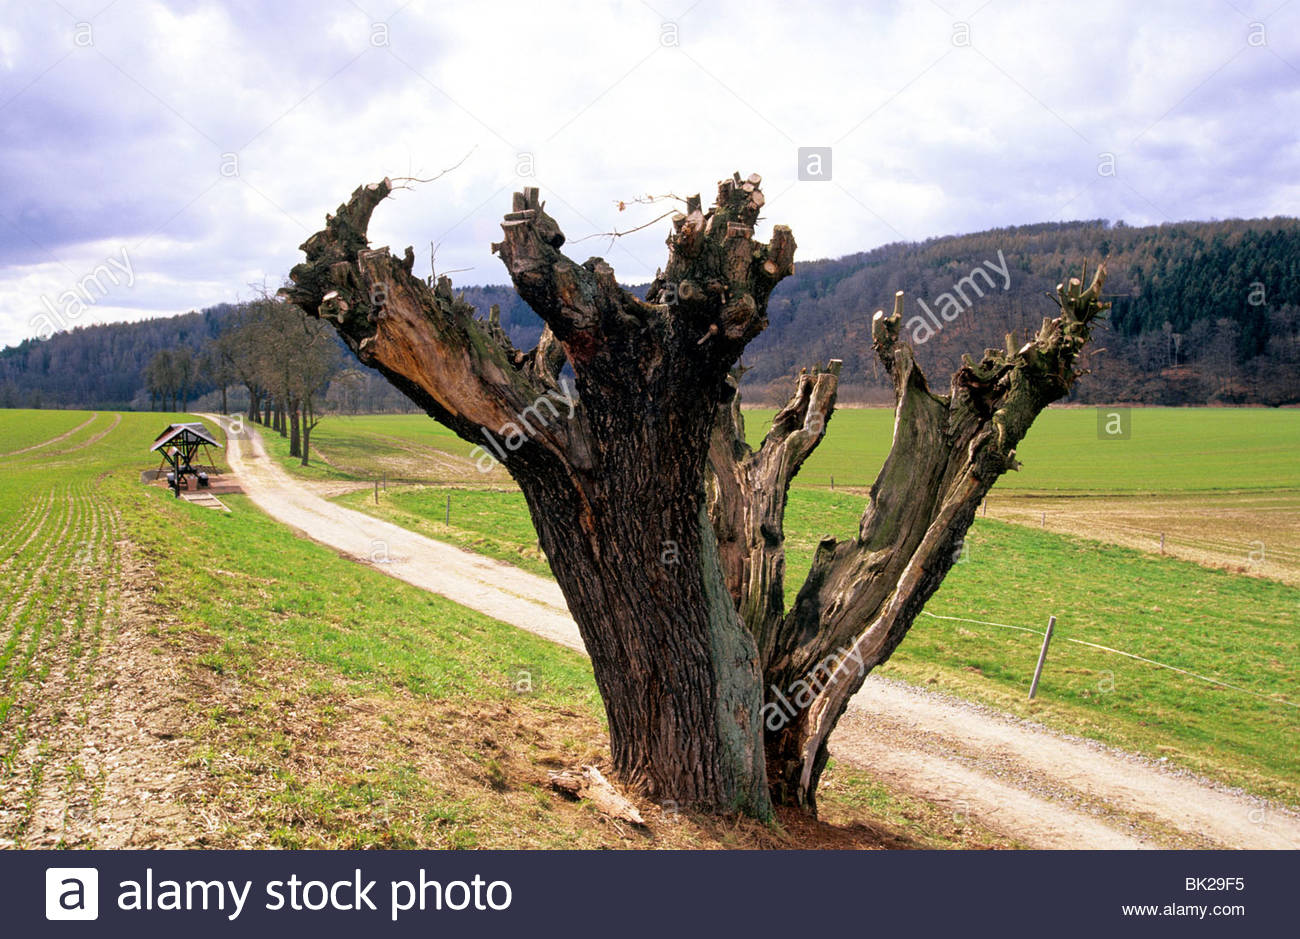 pollard willow tree, Germany - Stock Image